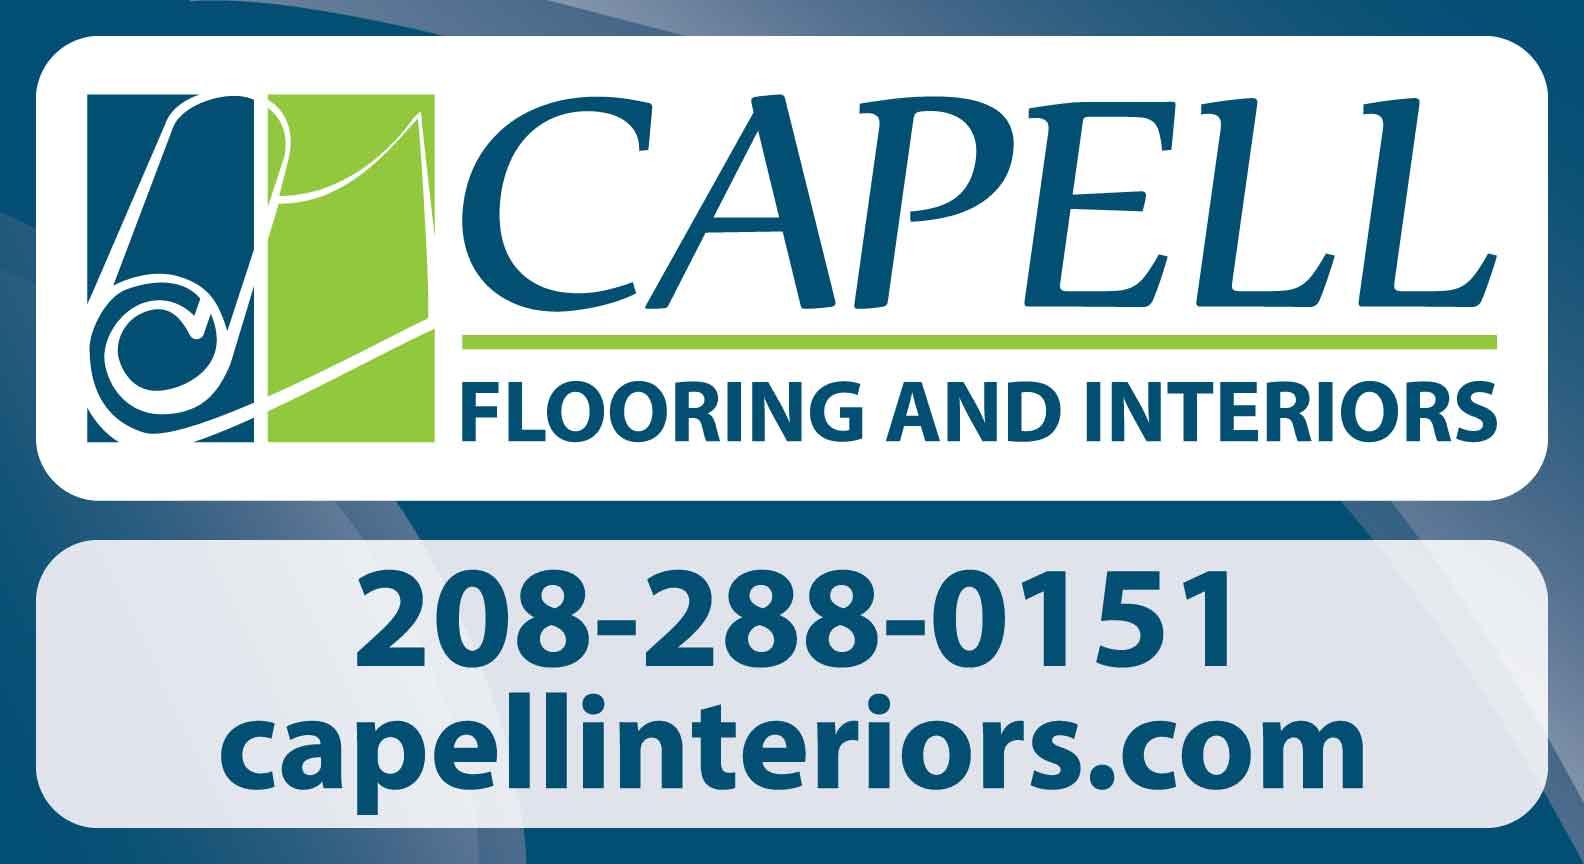 Capell Flooring and Interiors, Boise Flooring